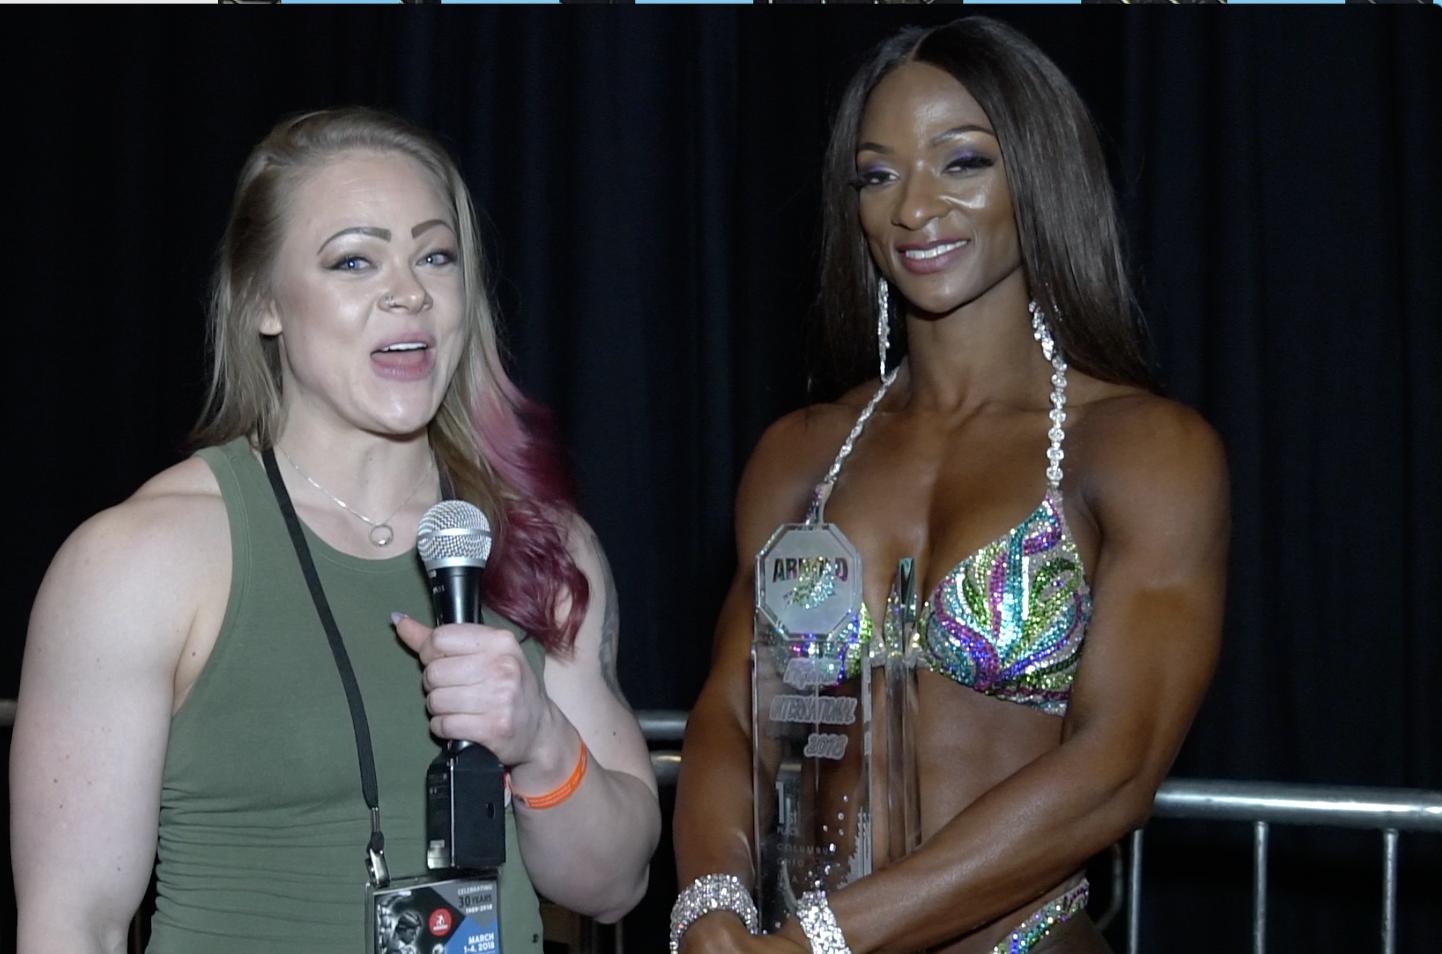 2018 Arnold Figure International Winner Candice Lewis Interview  By Jordan Hartsell For NPC NEWS ONLINE.com